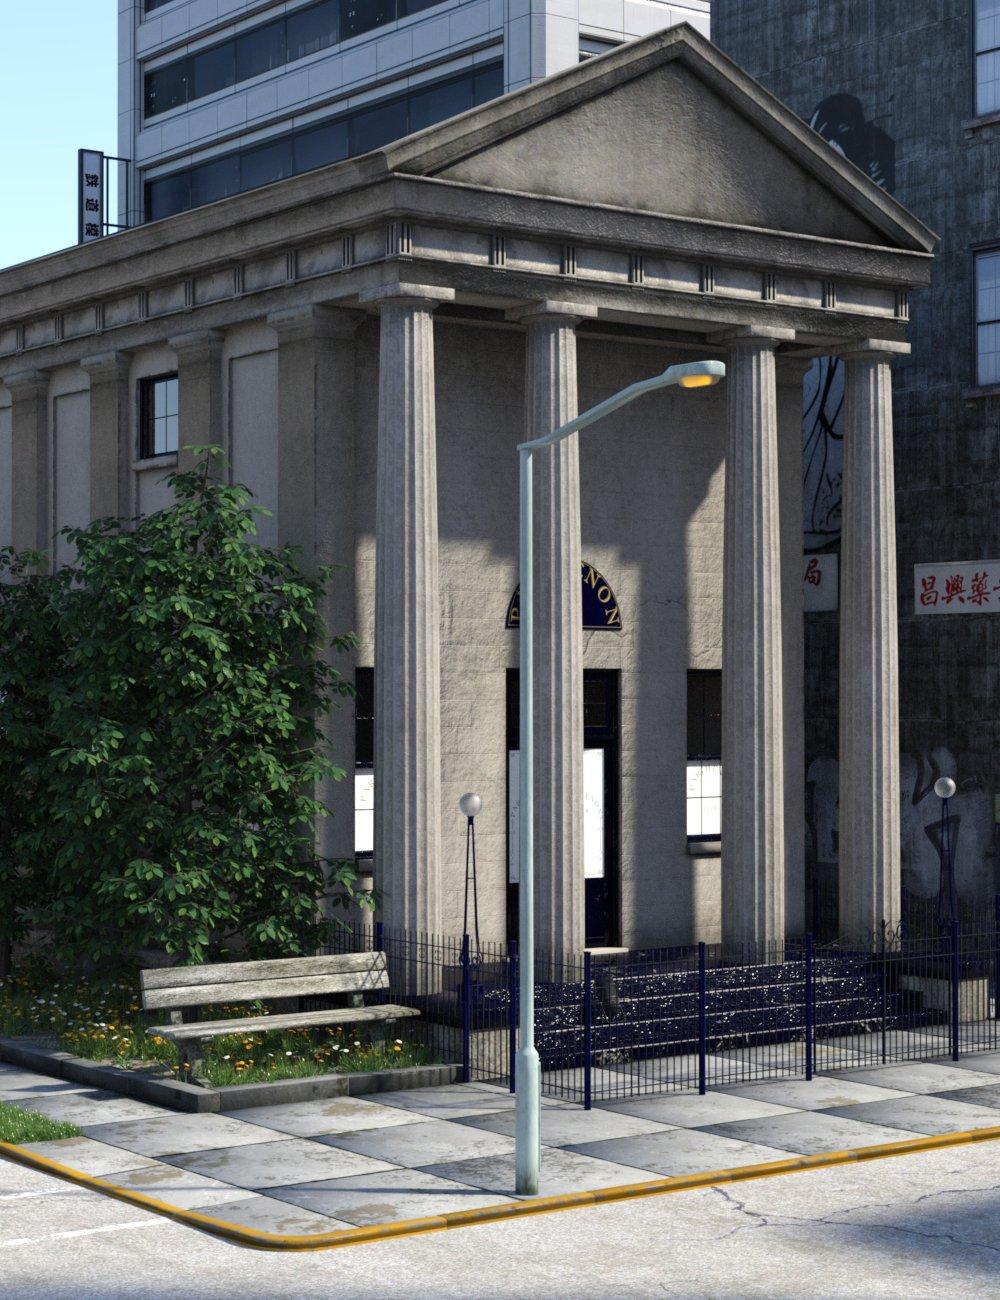 Parthenon Club by: TangoAlpha, 3D Models by Daz 3D